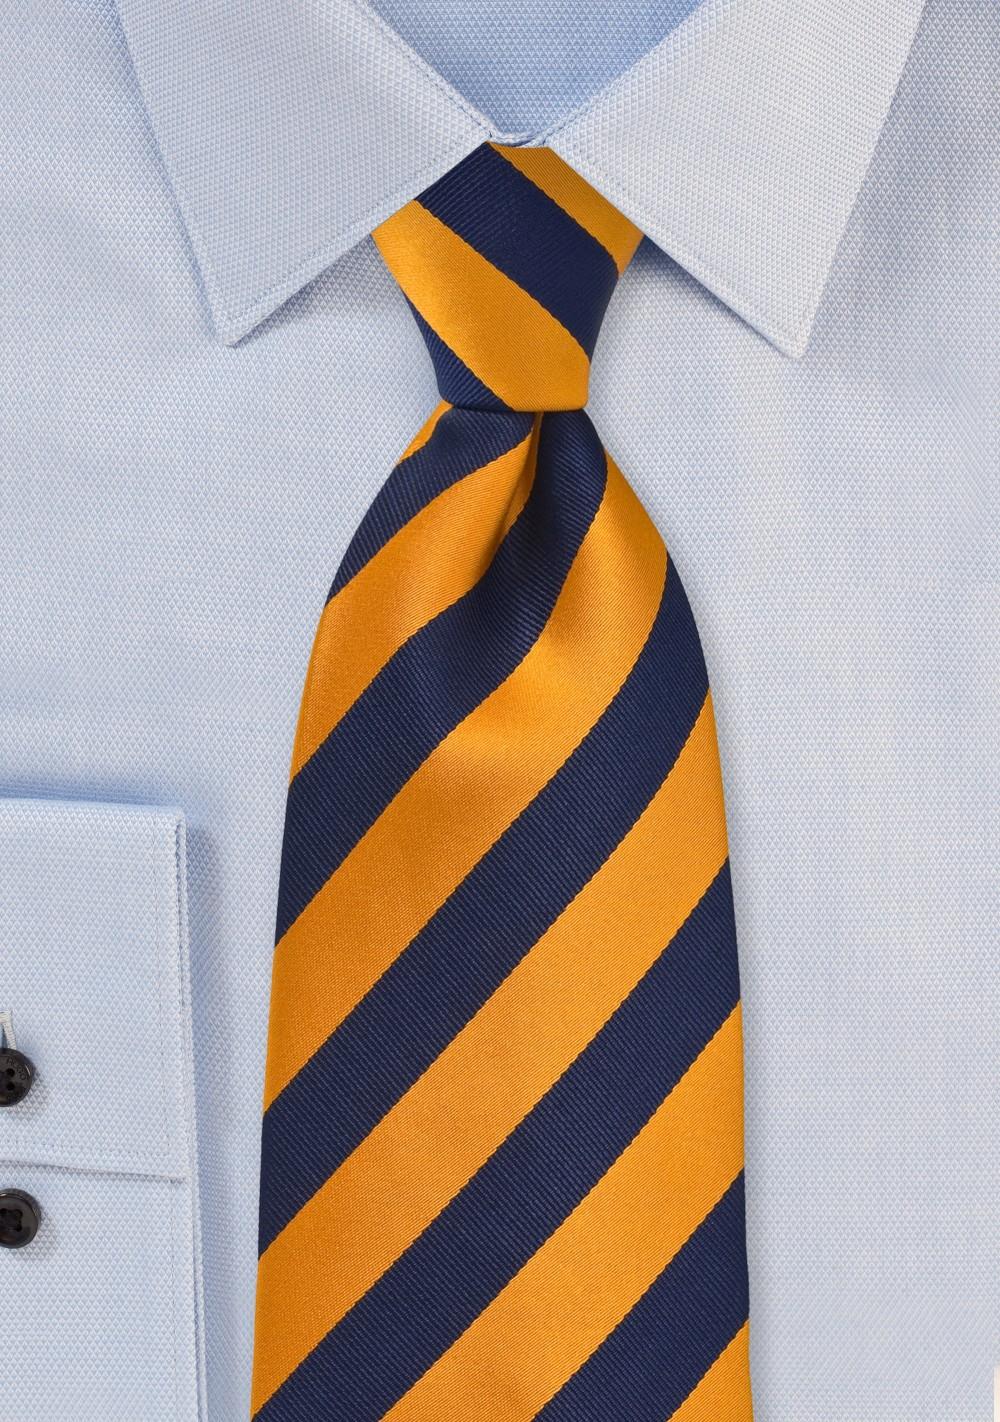 classic Black and White XL Necktie